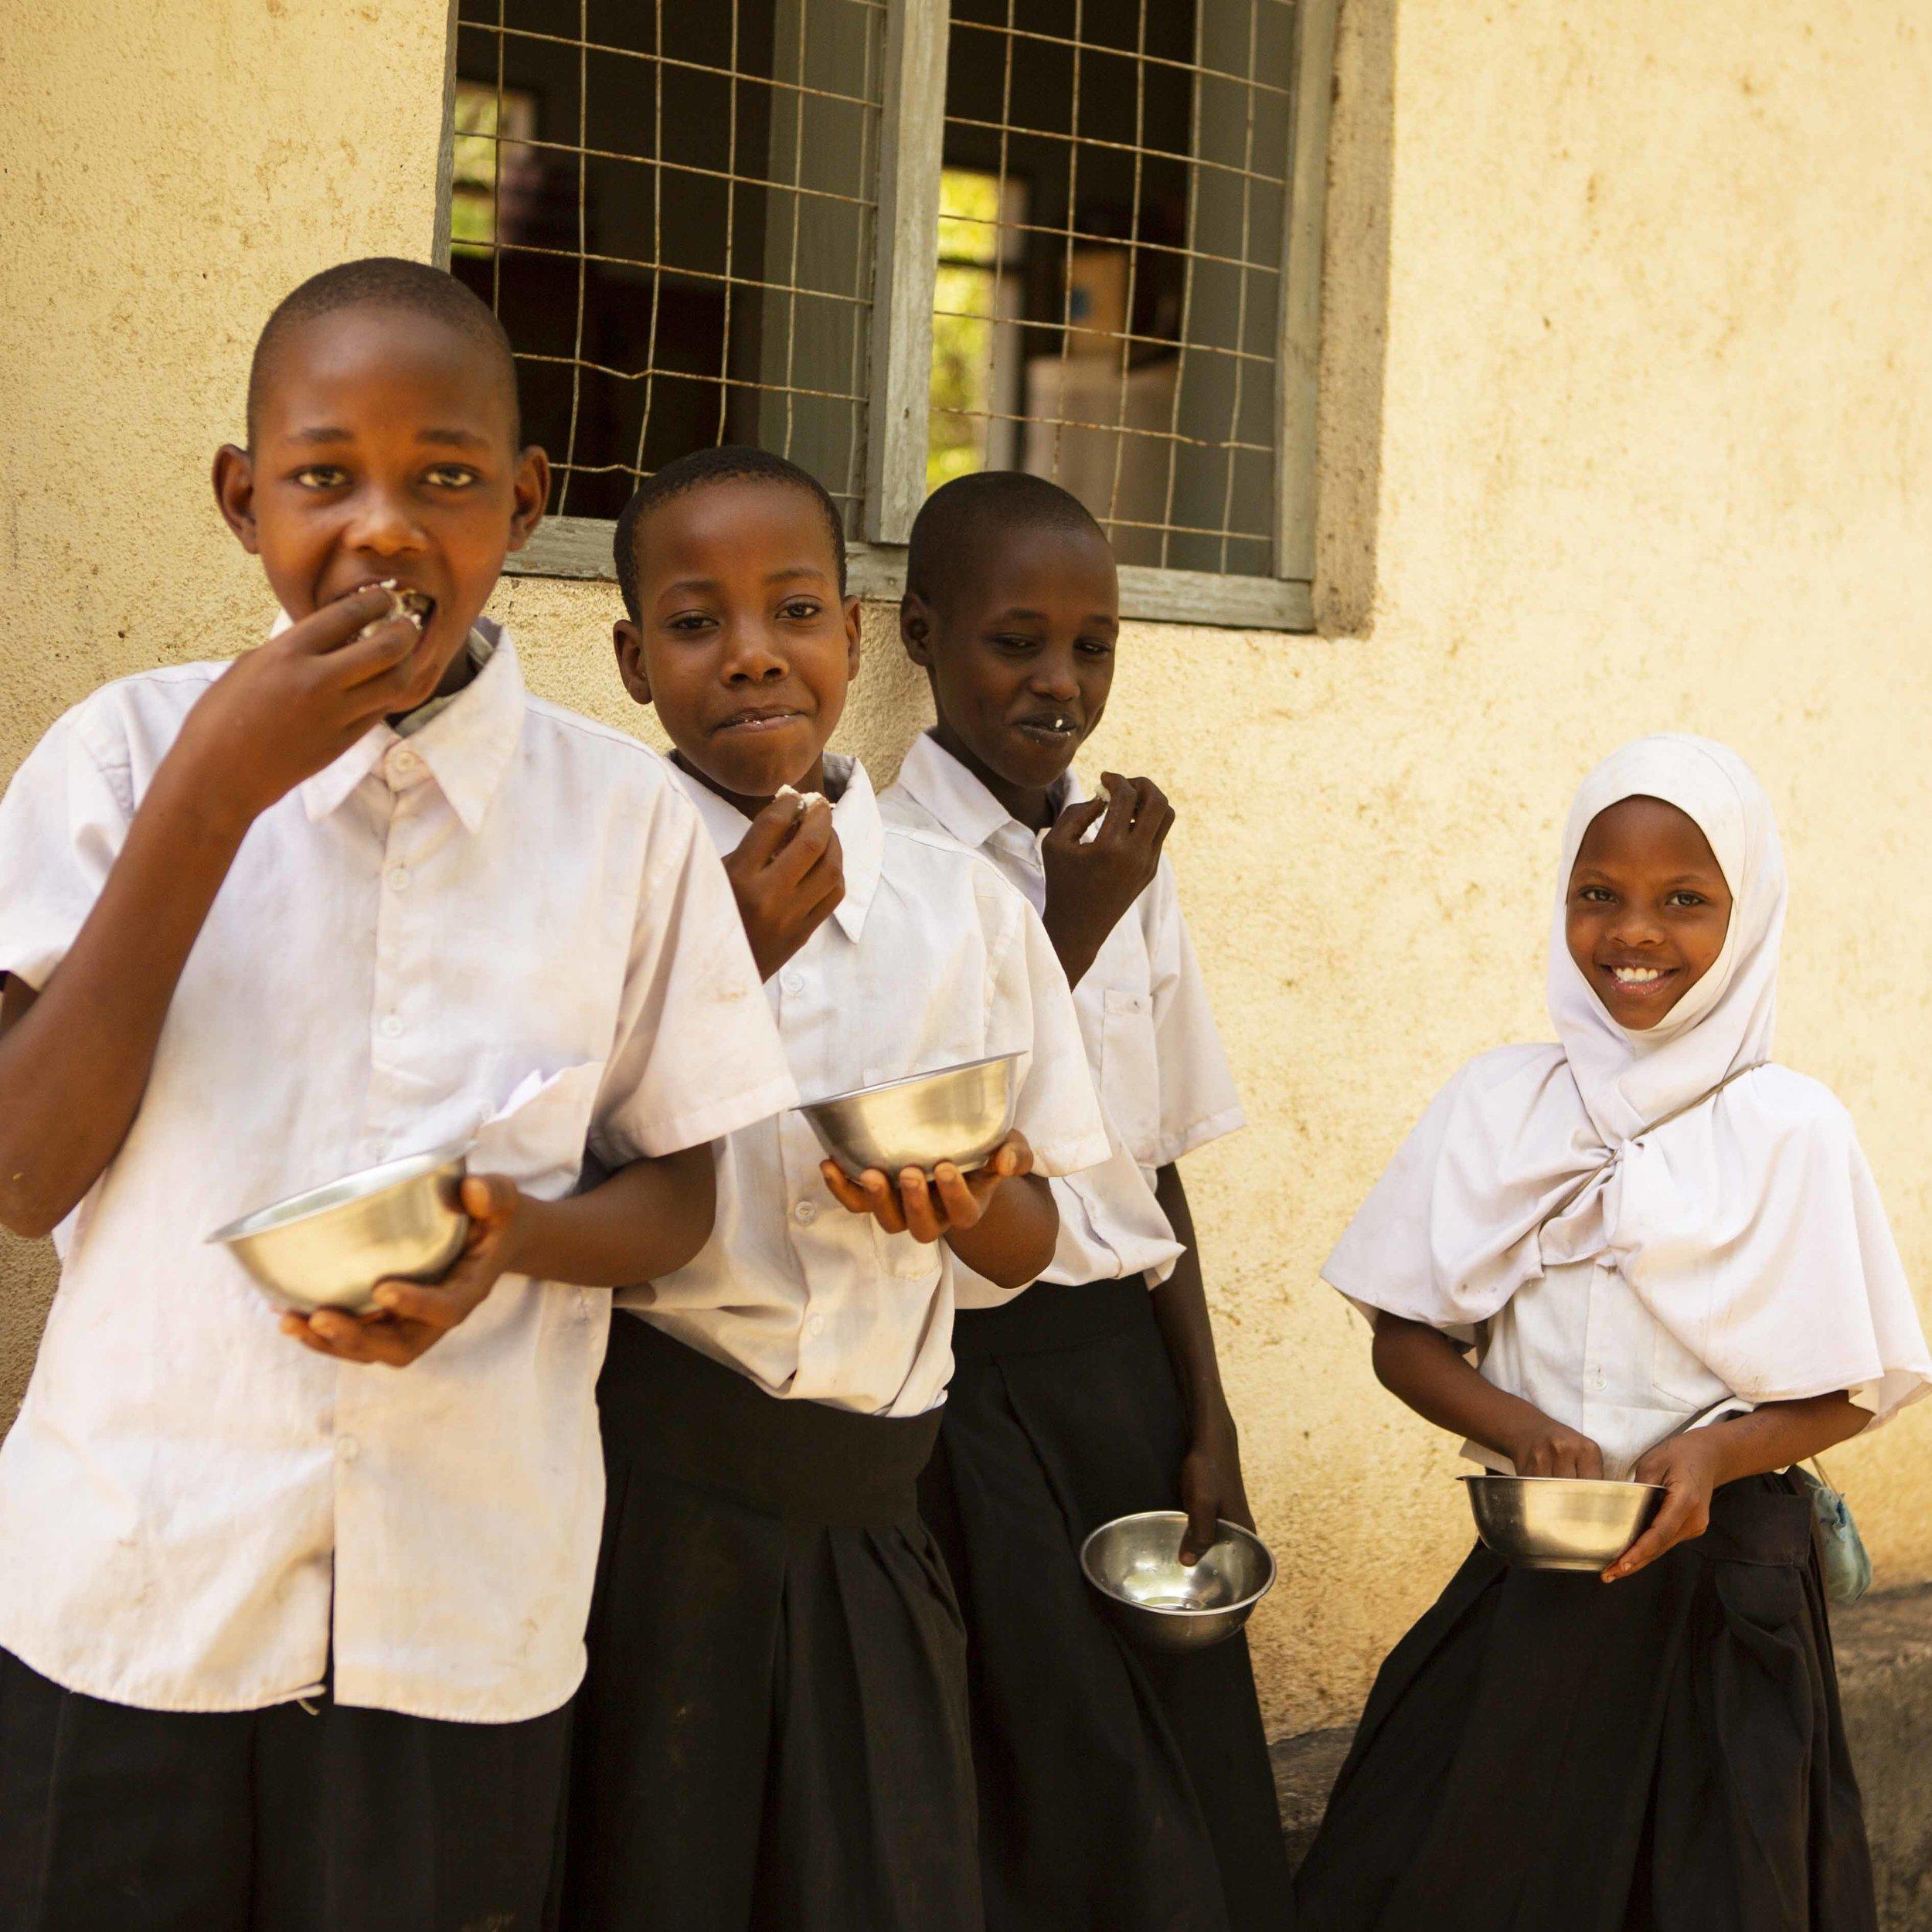 2019-02-07 Native Africa Tanzania School (455).jpg